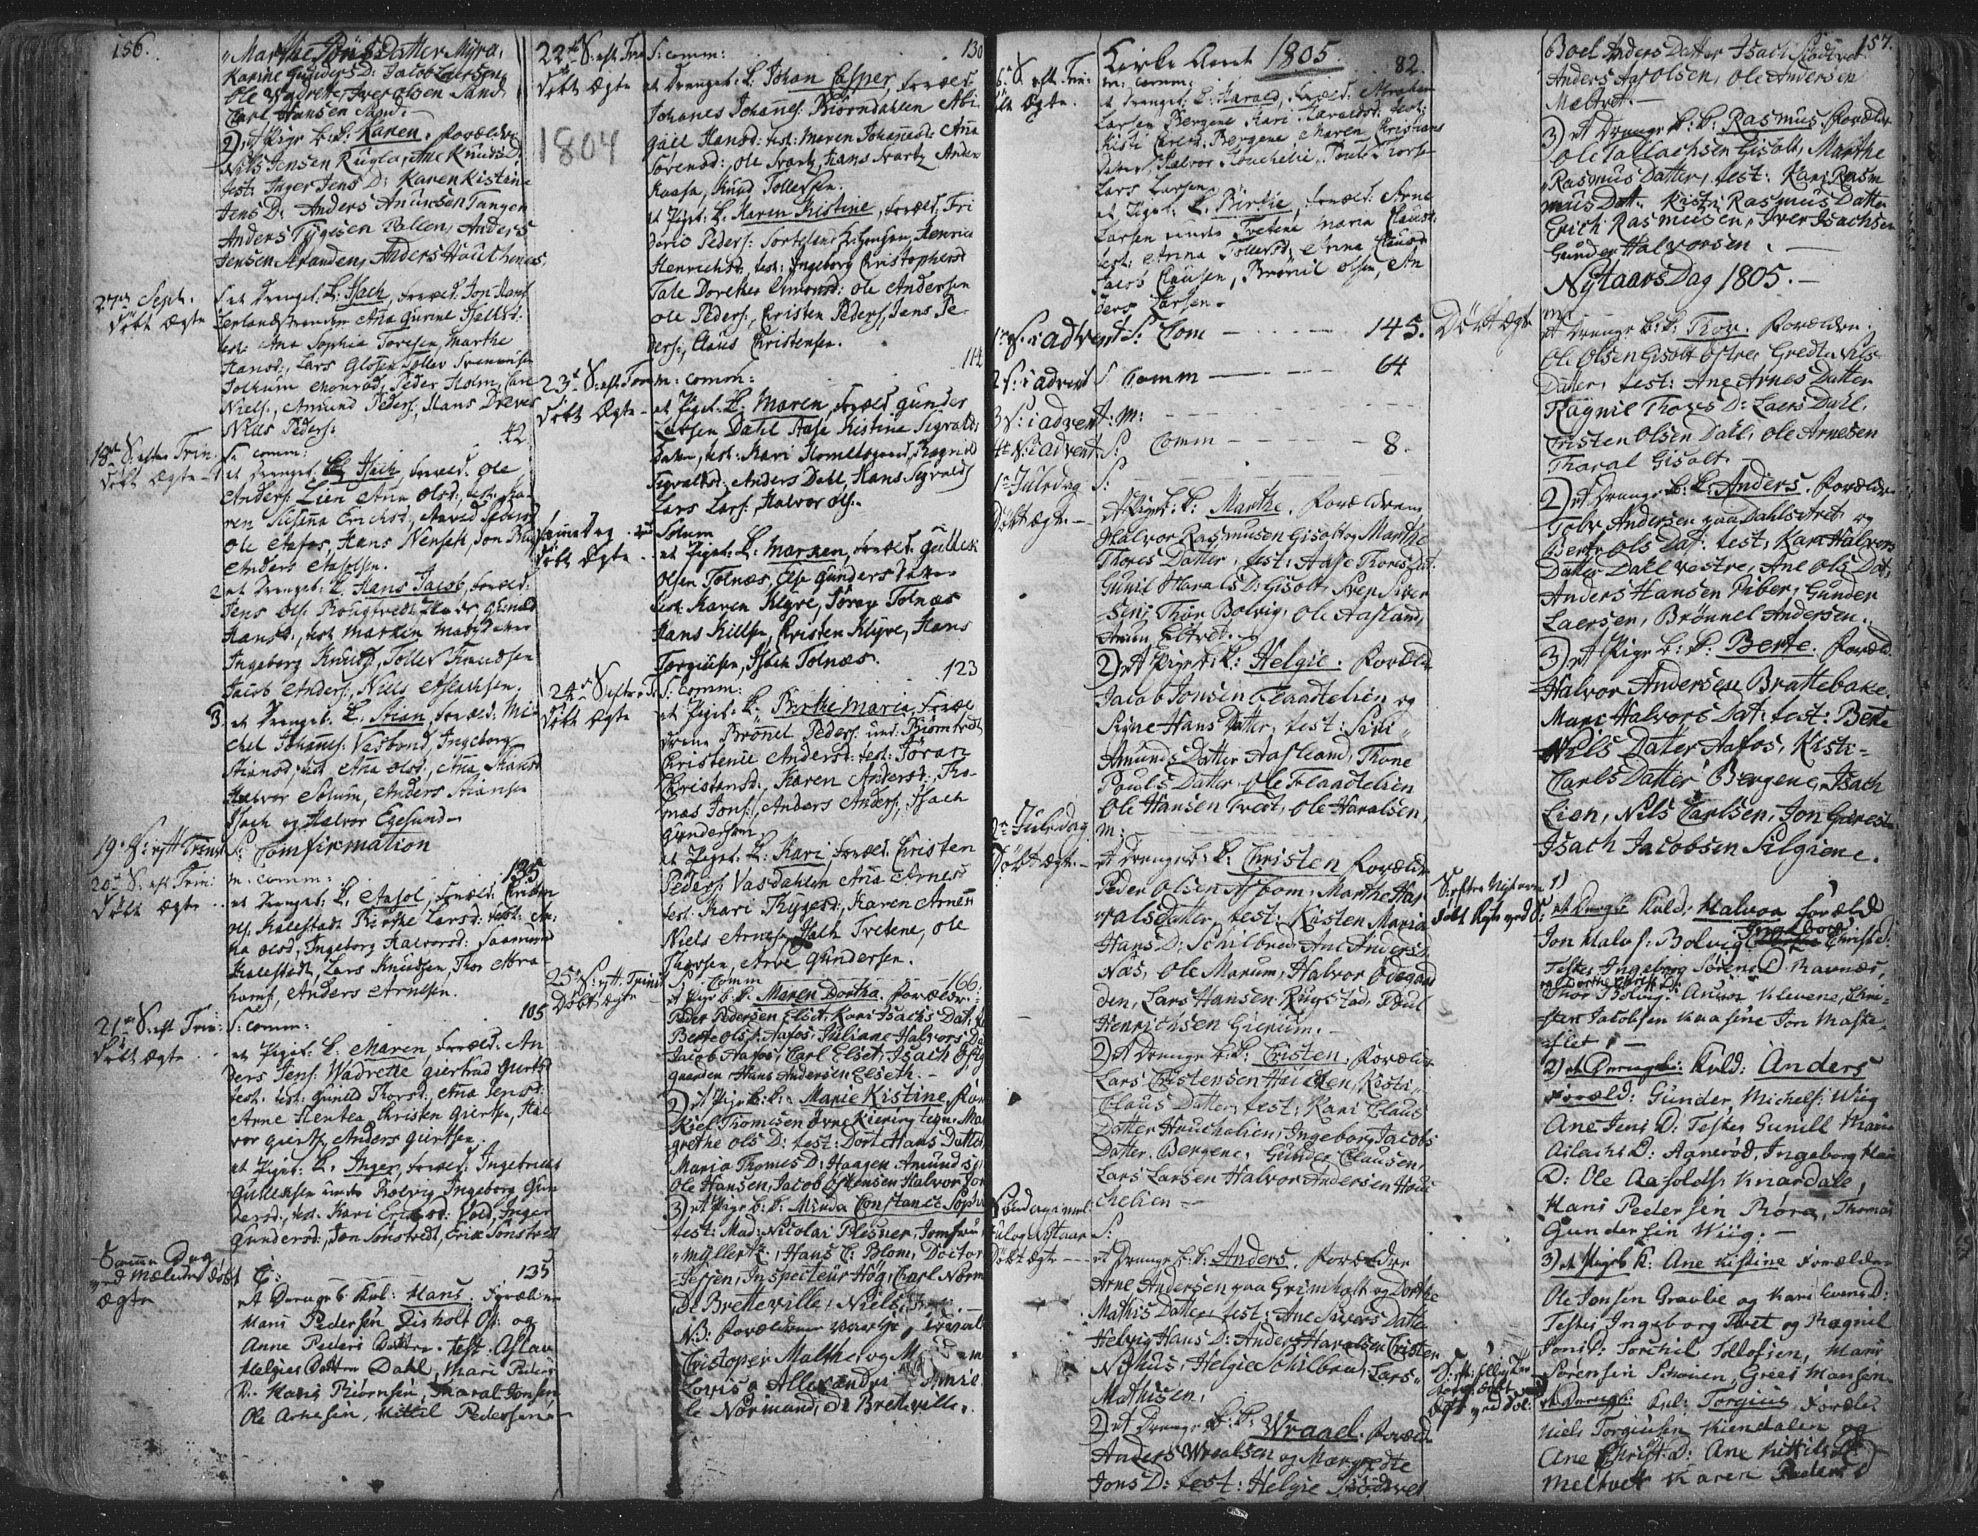 SAKO, Solum kirkebøker, F/Fa/L0003: Ministerialbok nr. I 3, 1761-1814, s. 156-157